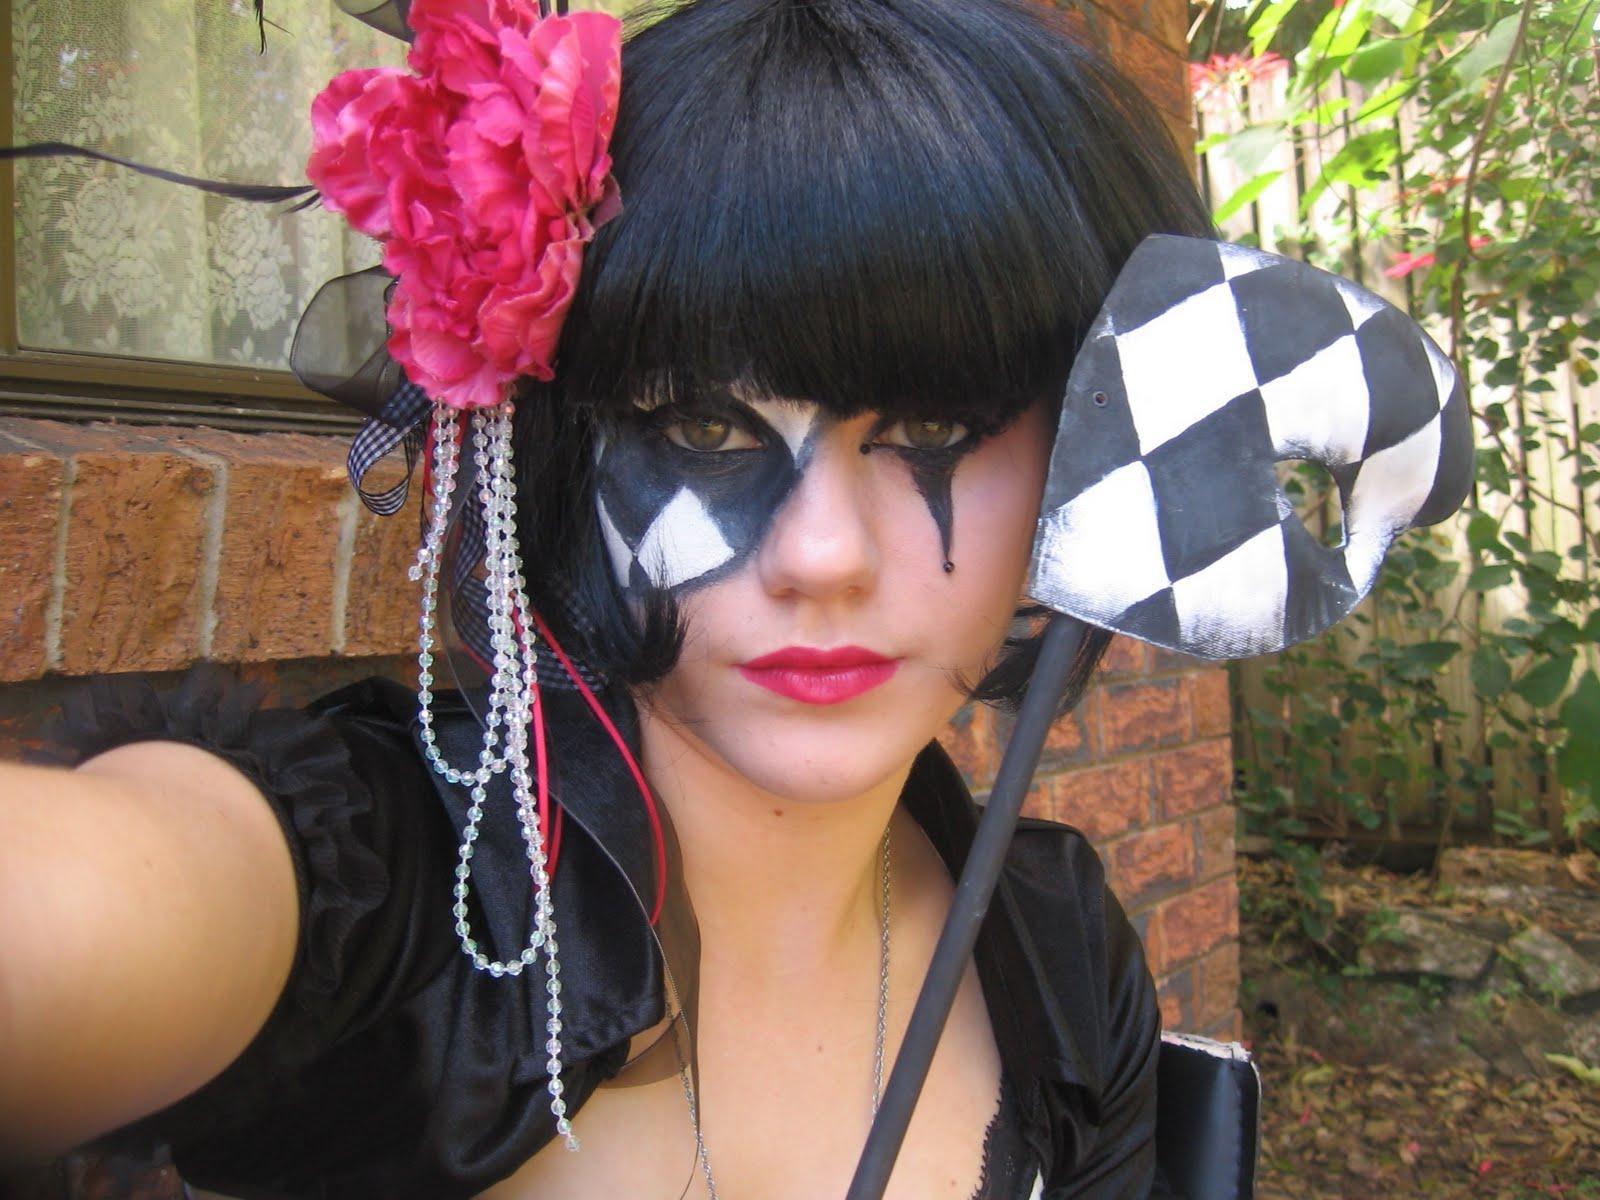 Mardi Gras Harlequin Half Mask